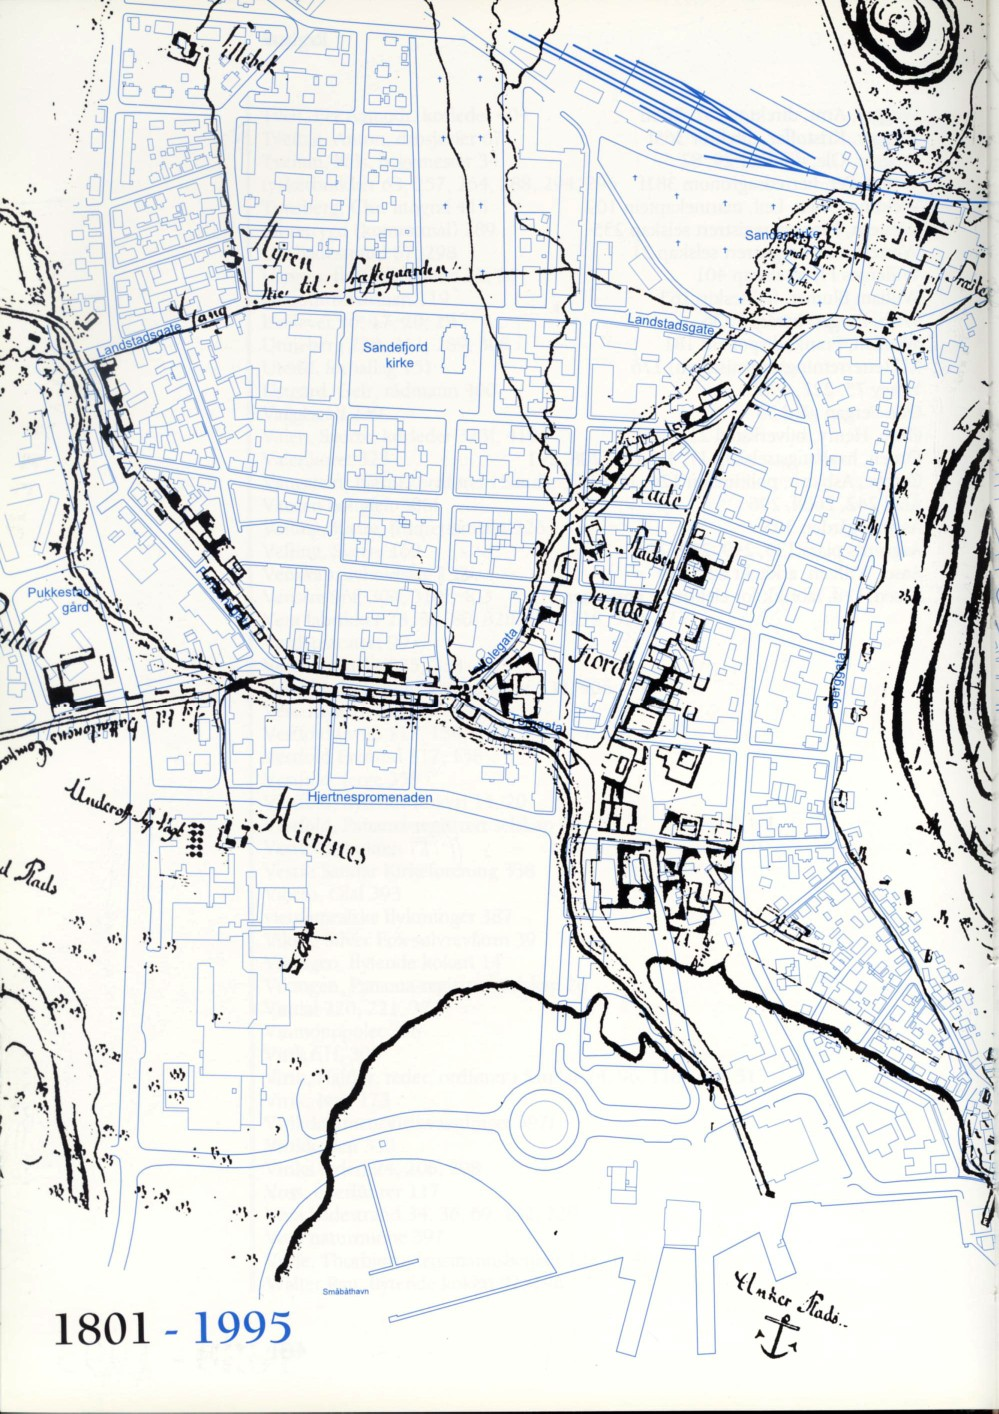 kart over sandefjord sentrum Gamle lokale kart kart over sandefjord sentrum